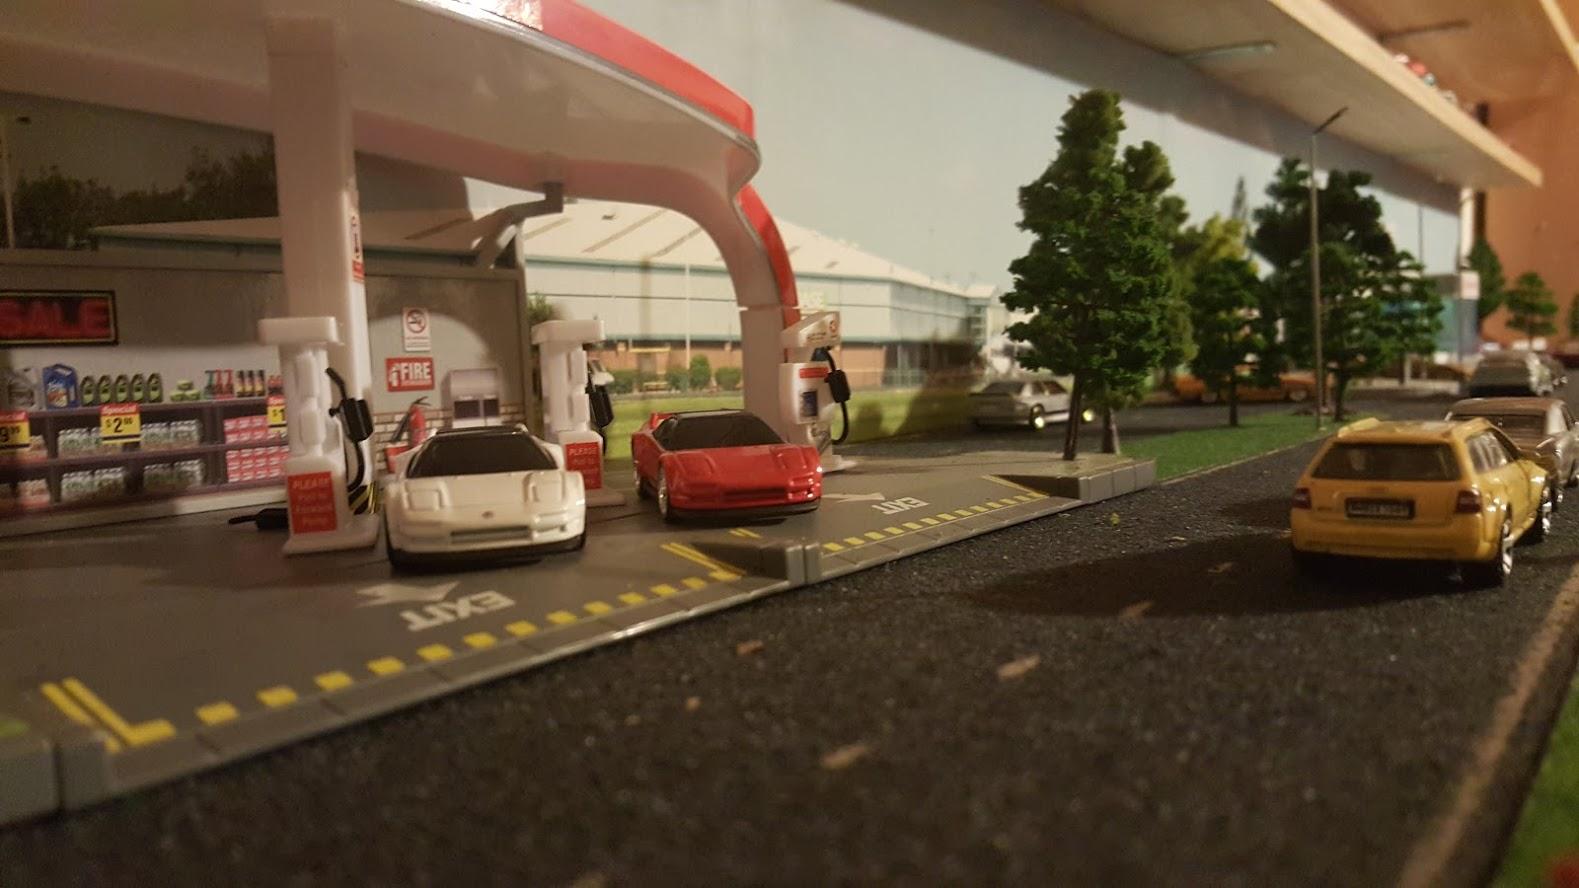 How To Make a 1:64 Scale Diorama | Hotwheels Diecast Cars